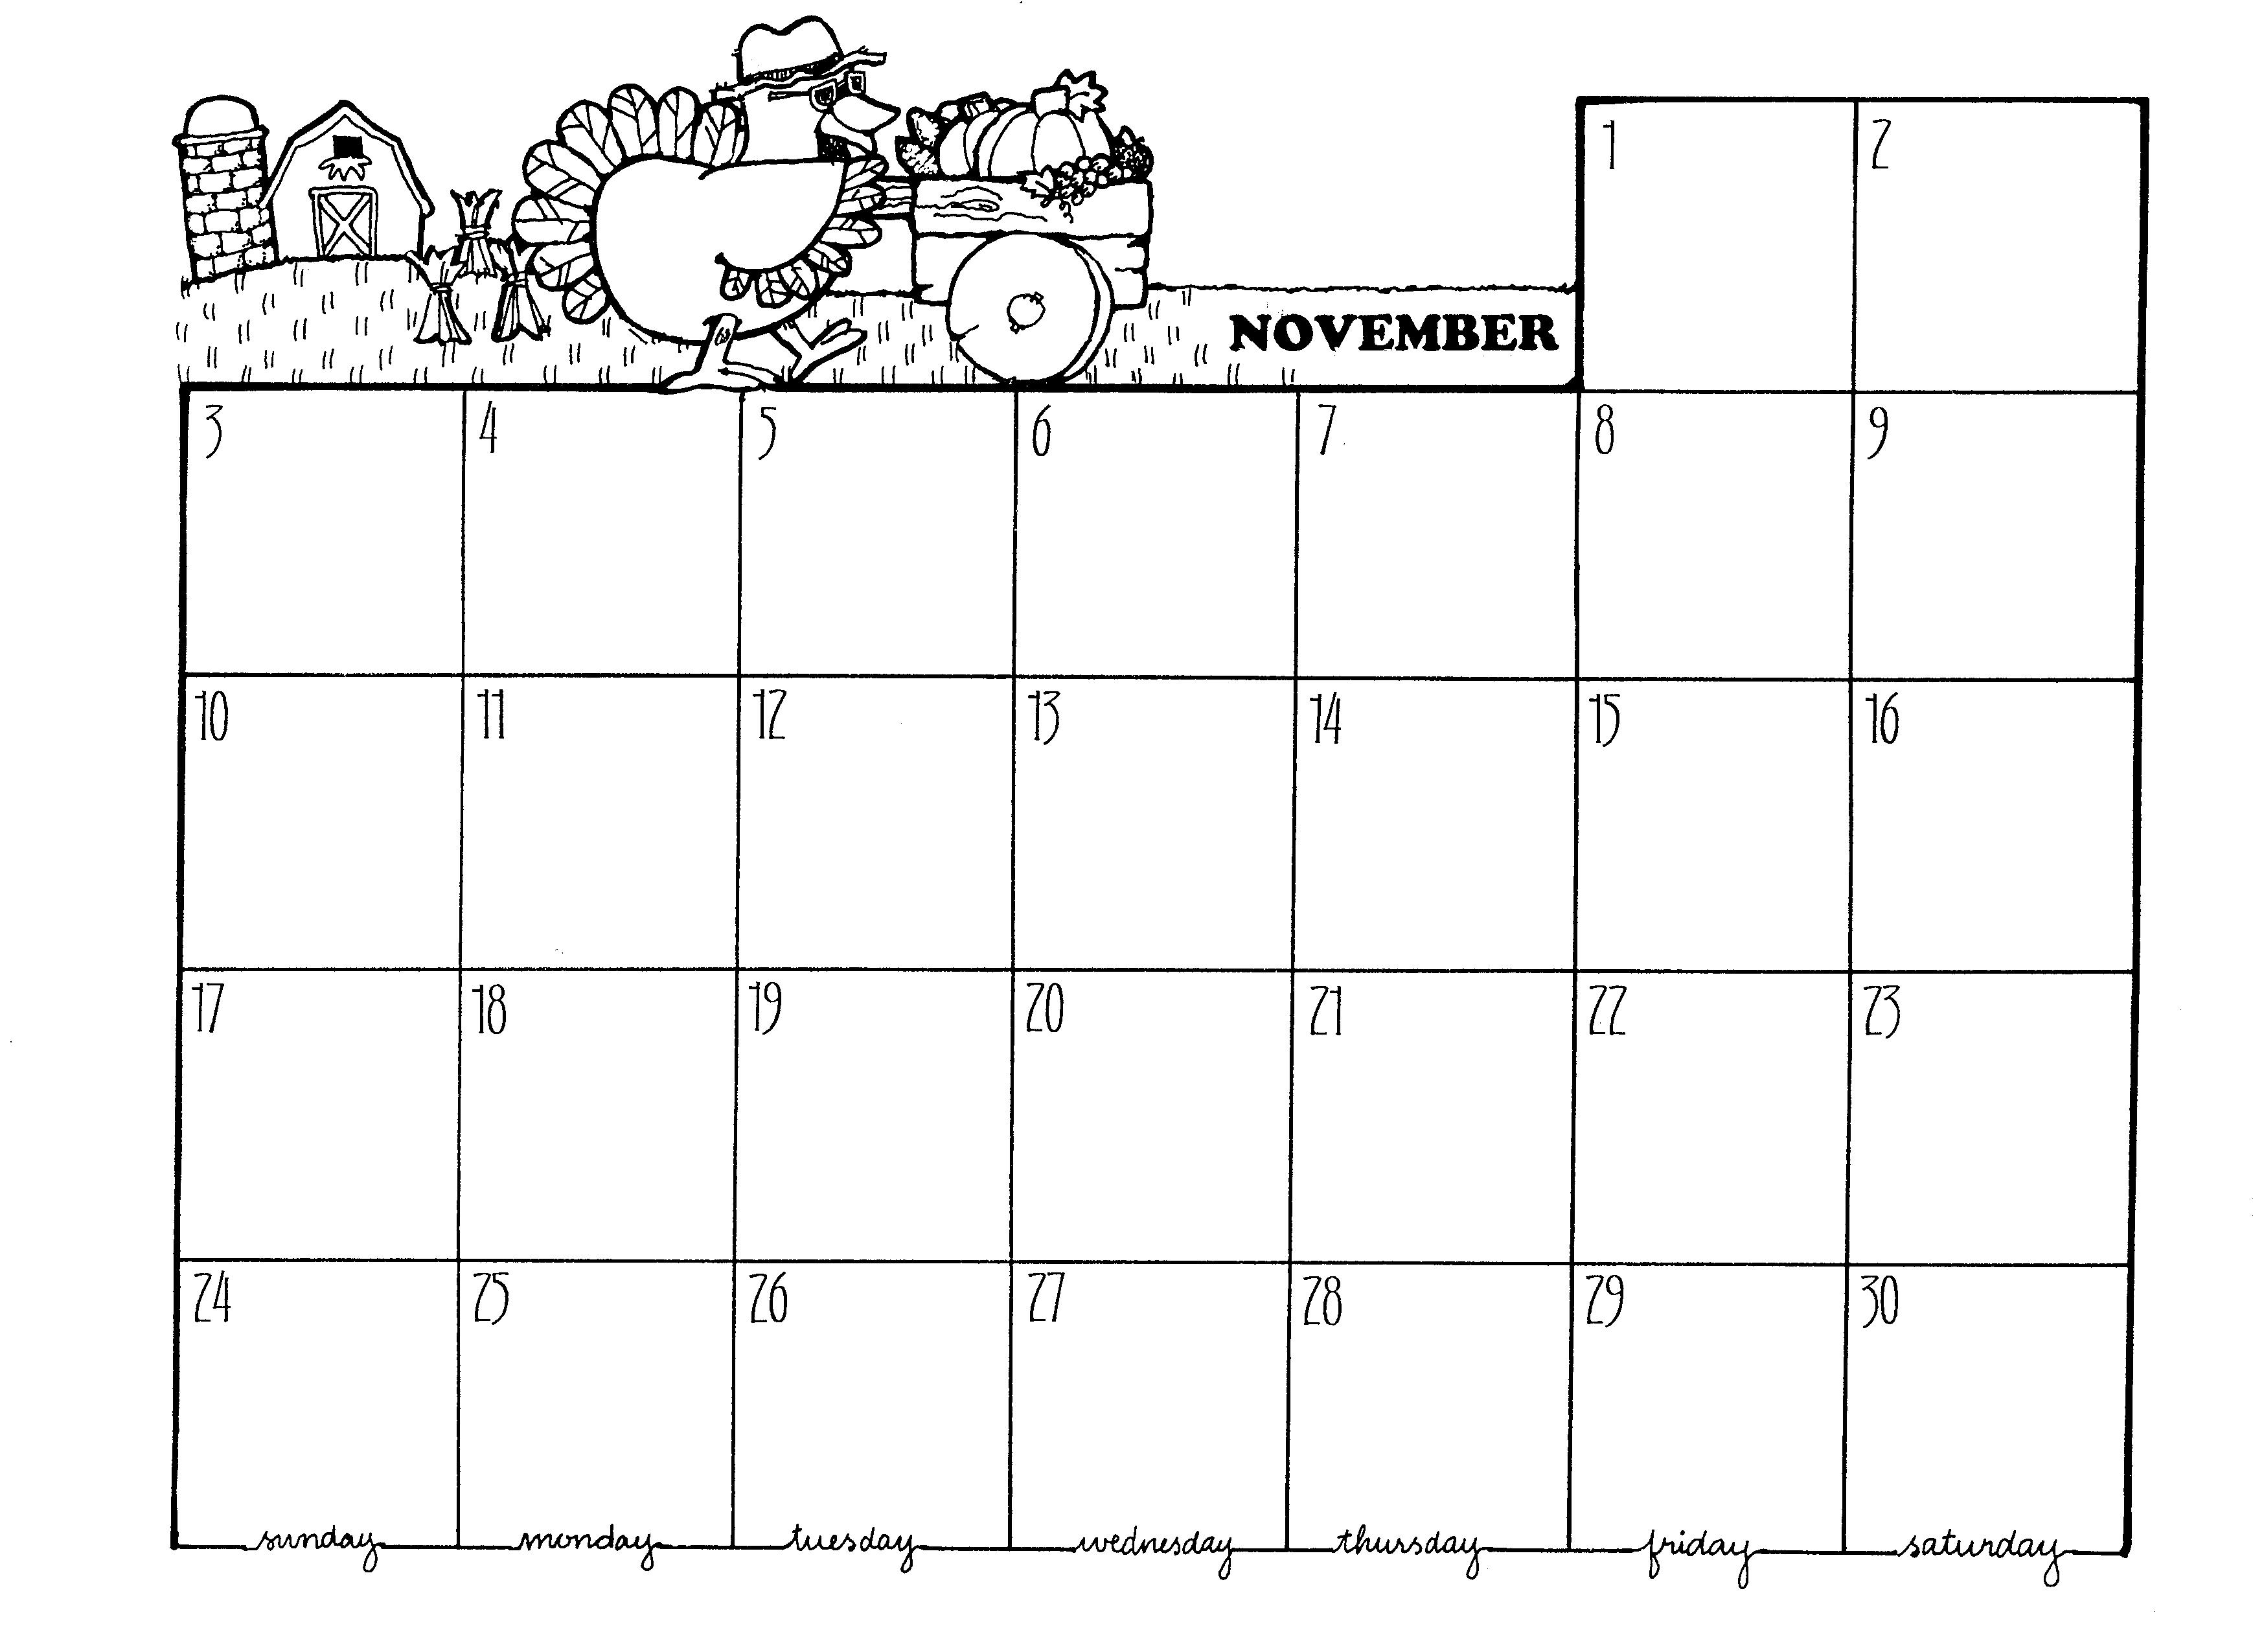 November calendar 2016 clipart library November calendar black and white clipart - ClipartFest library